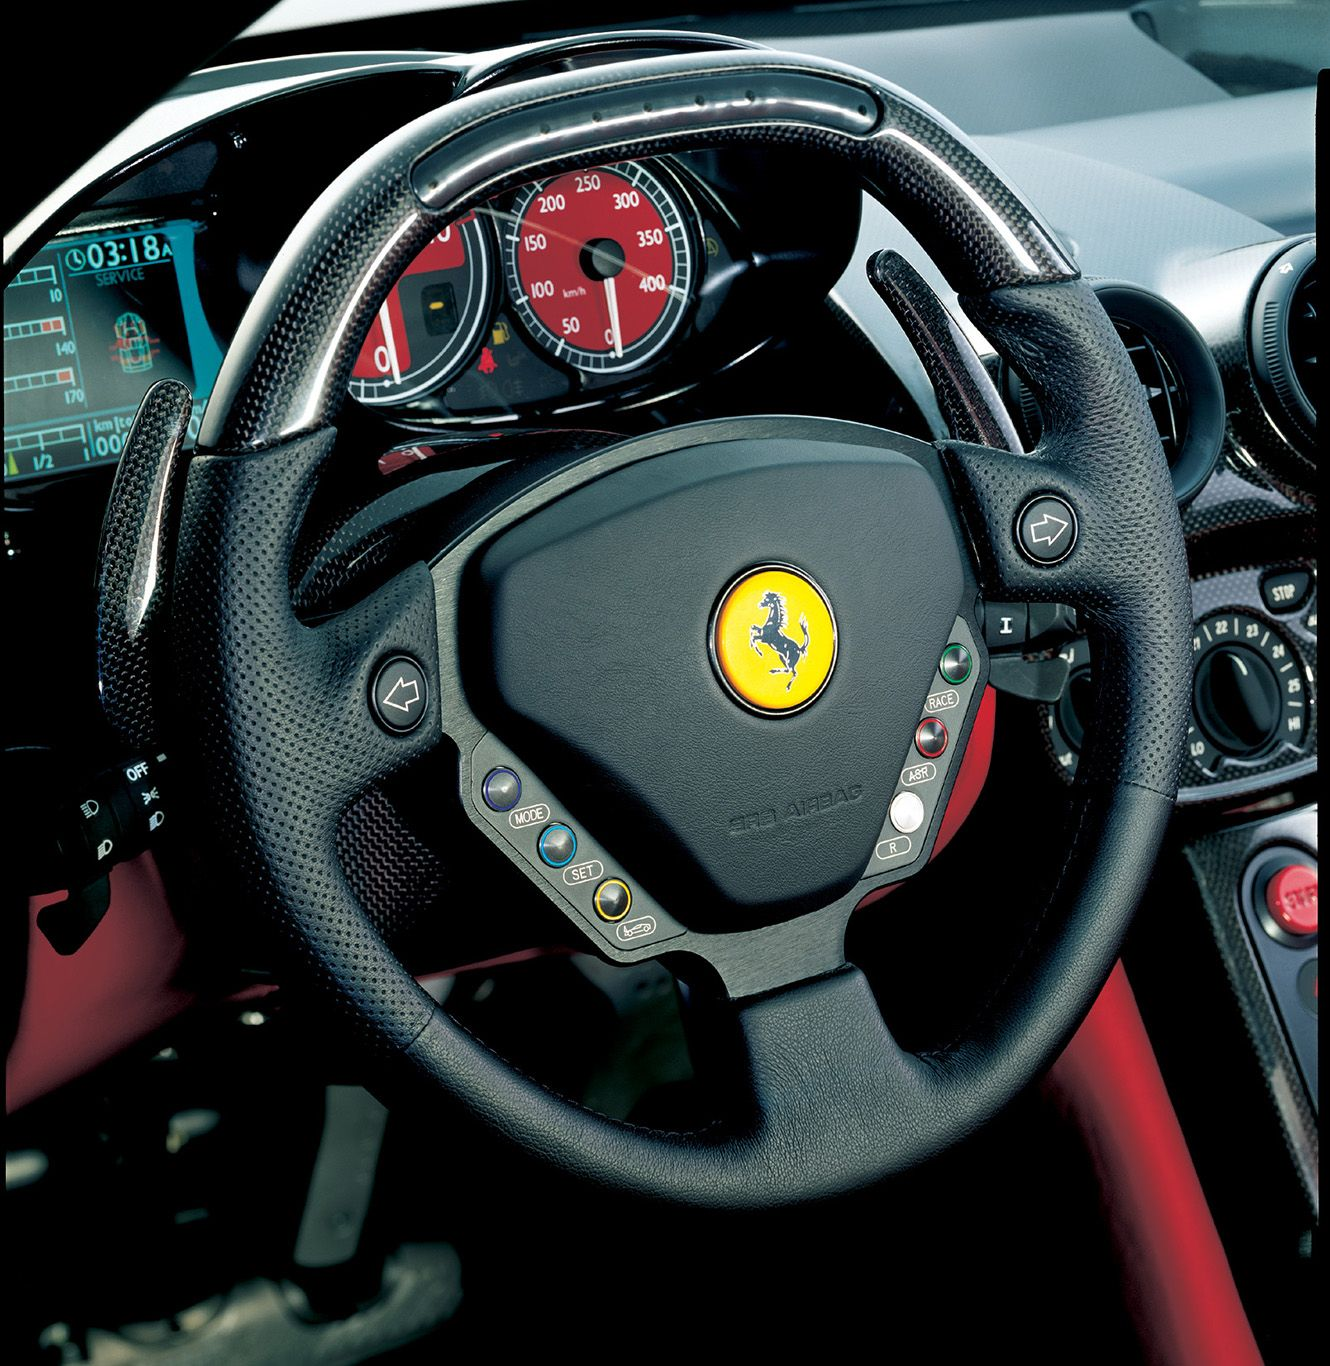 Lenkrad und Cockpit des Ferrari Enzo